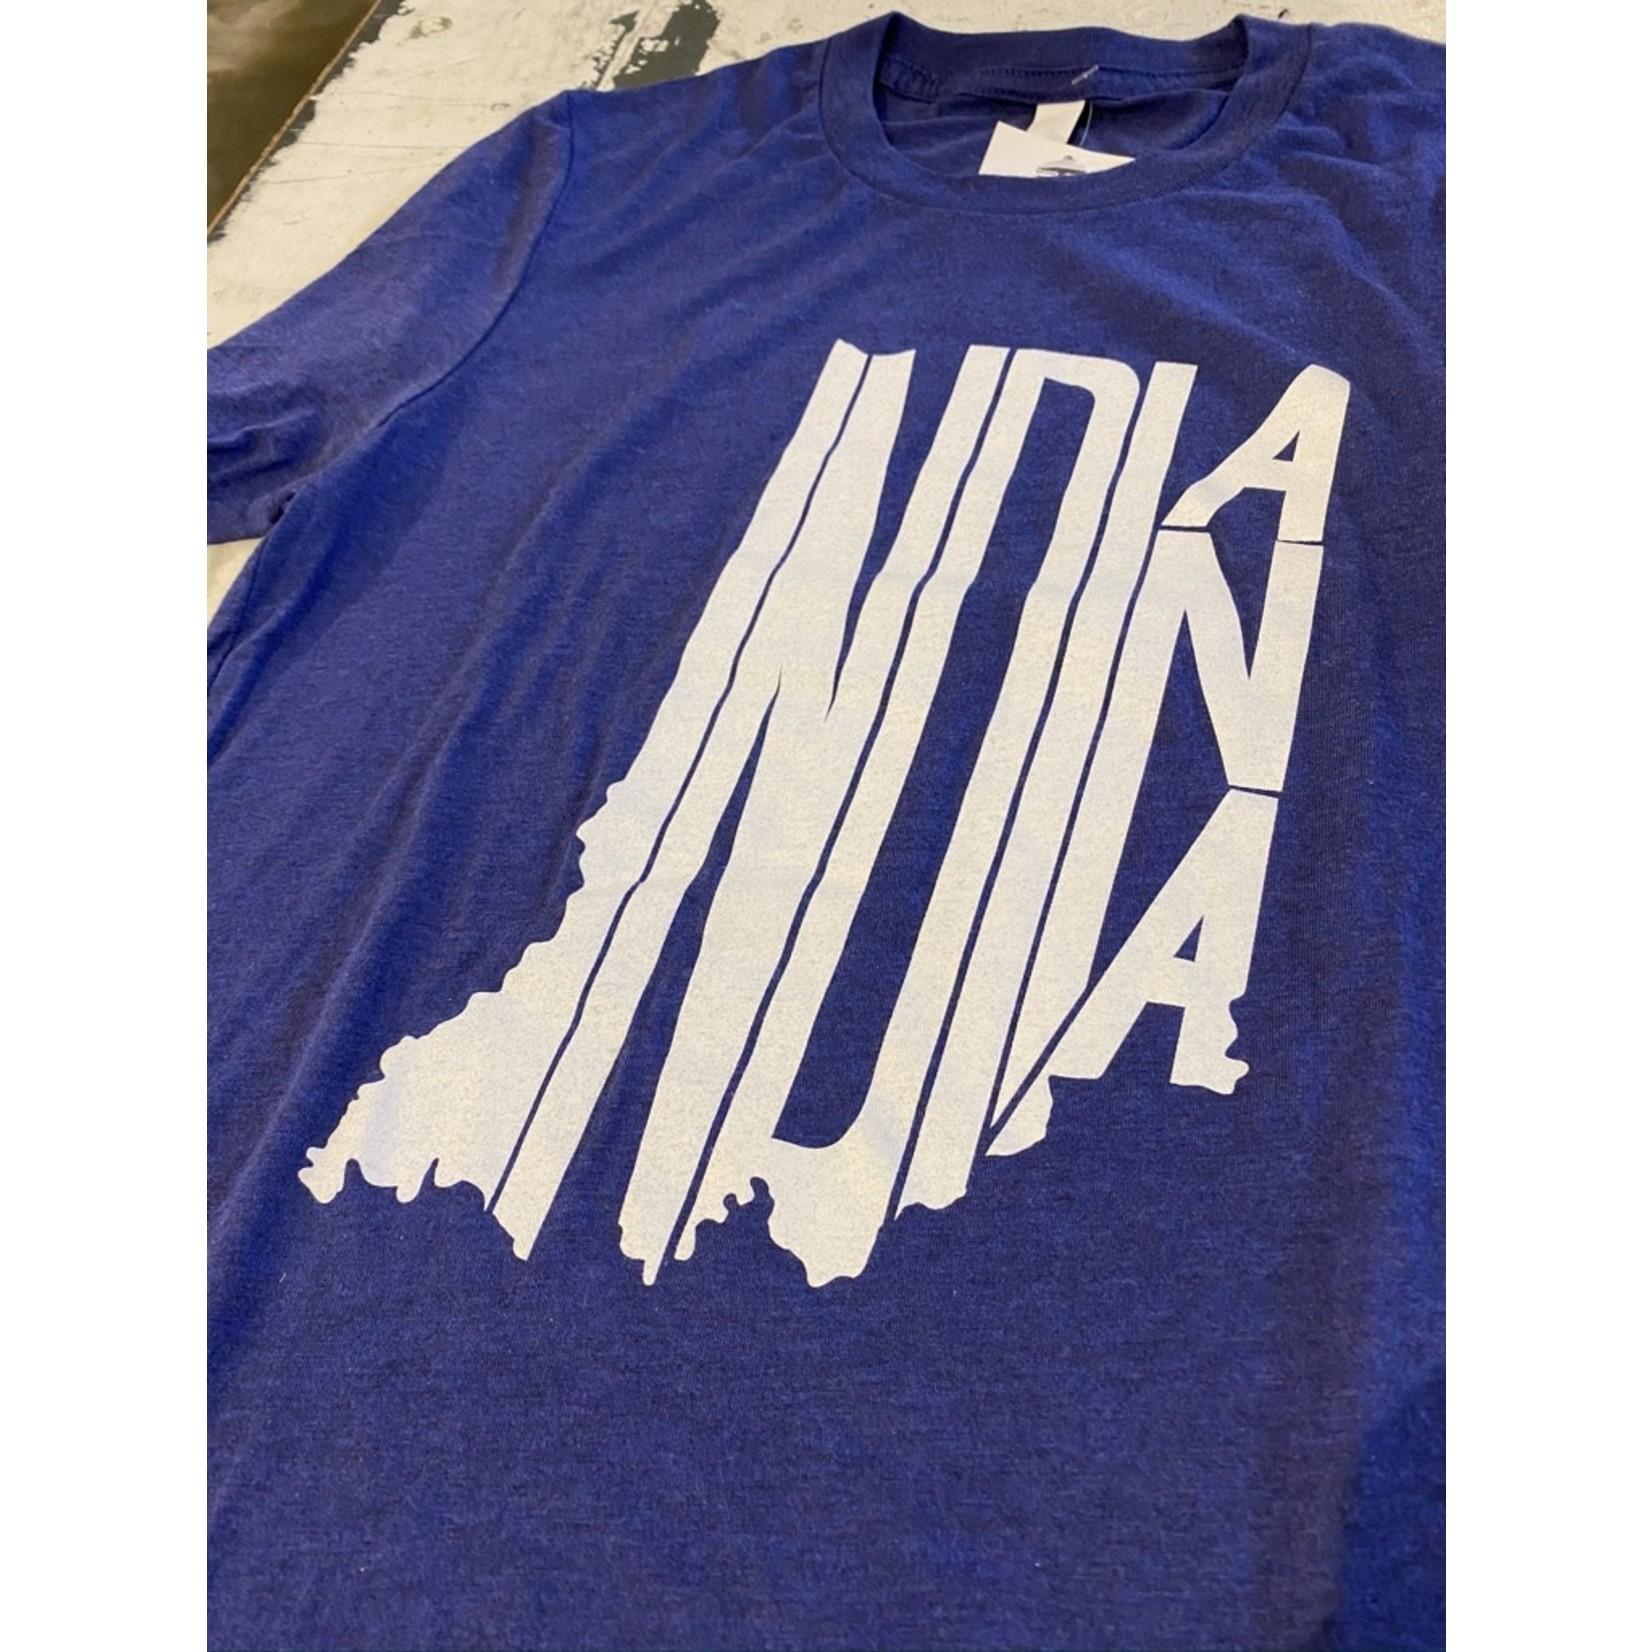 The Stately Shirt Co. Indiana Stately Navy Tee